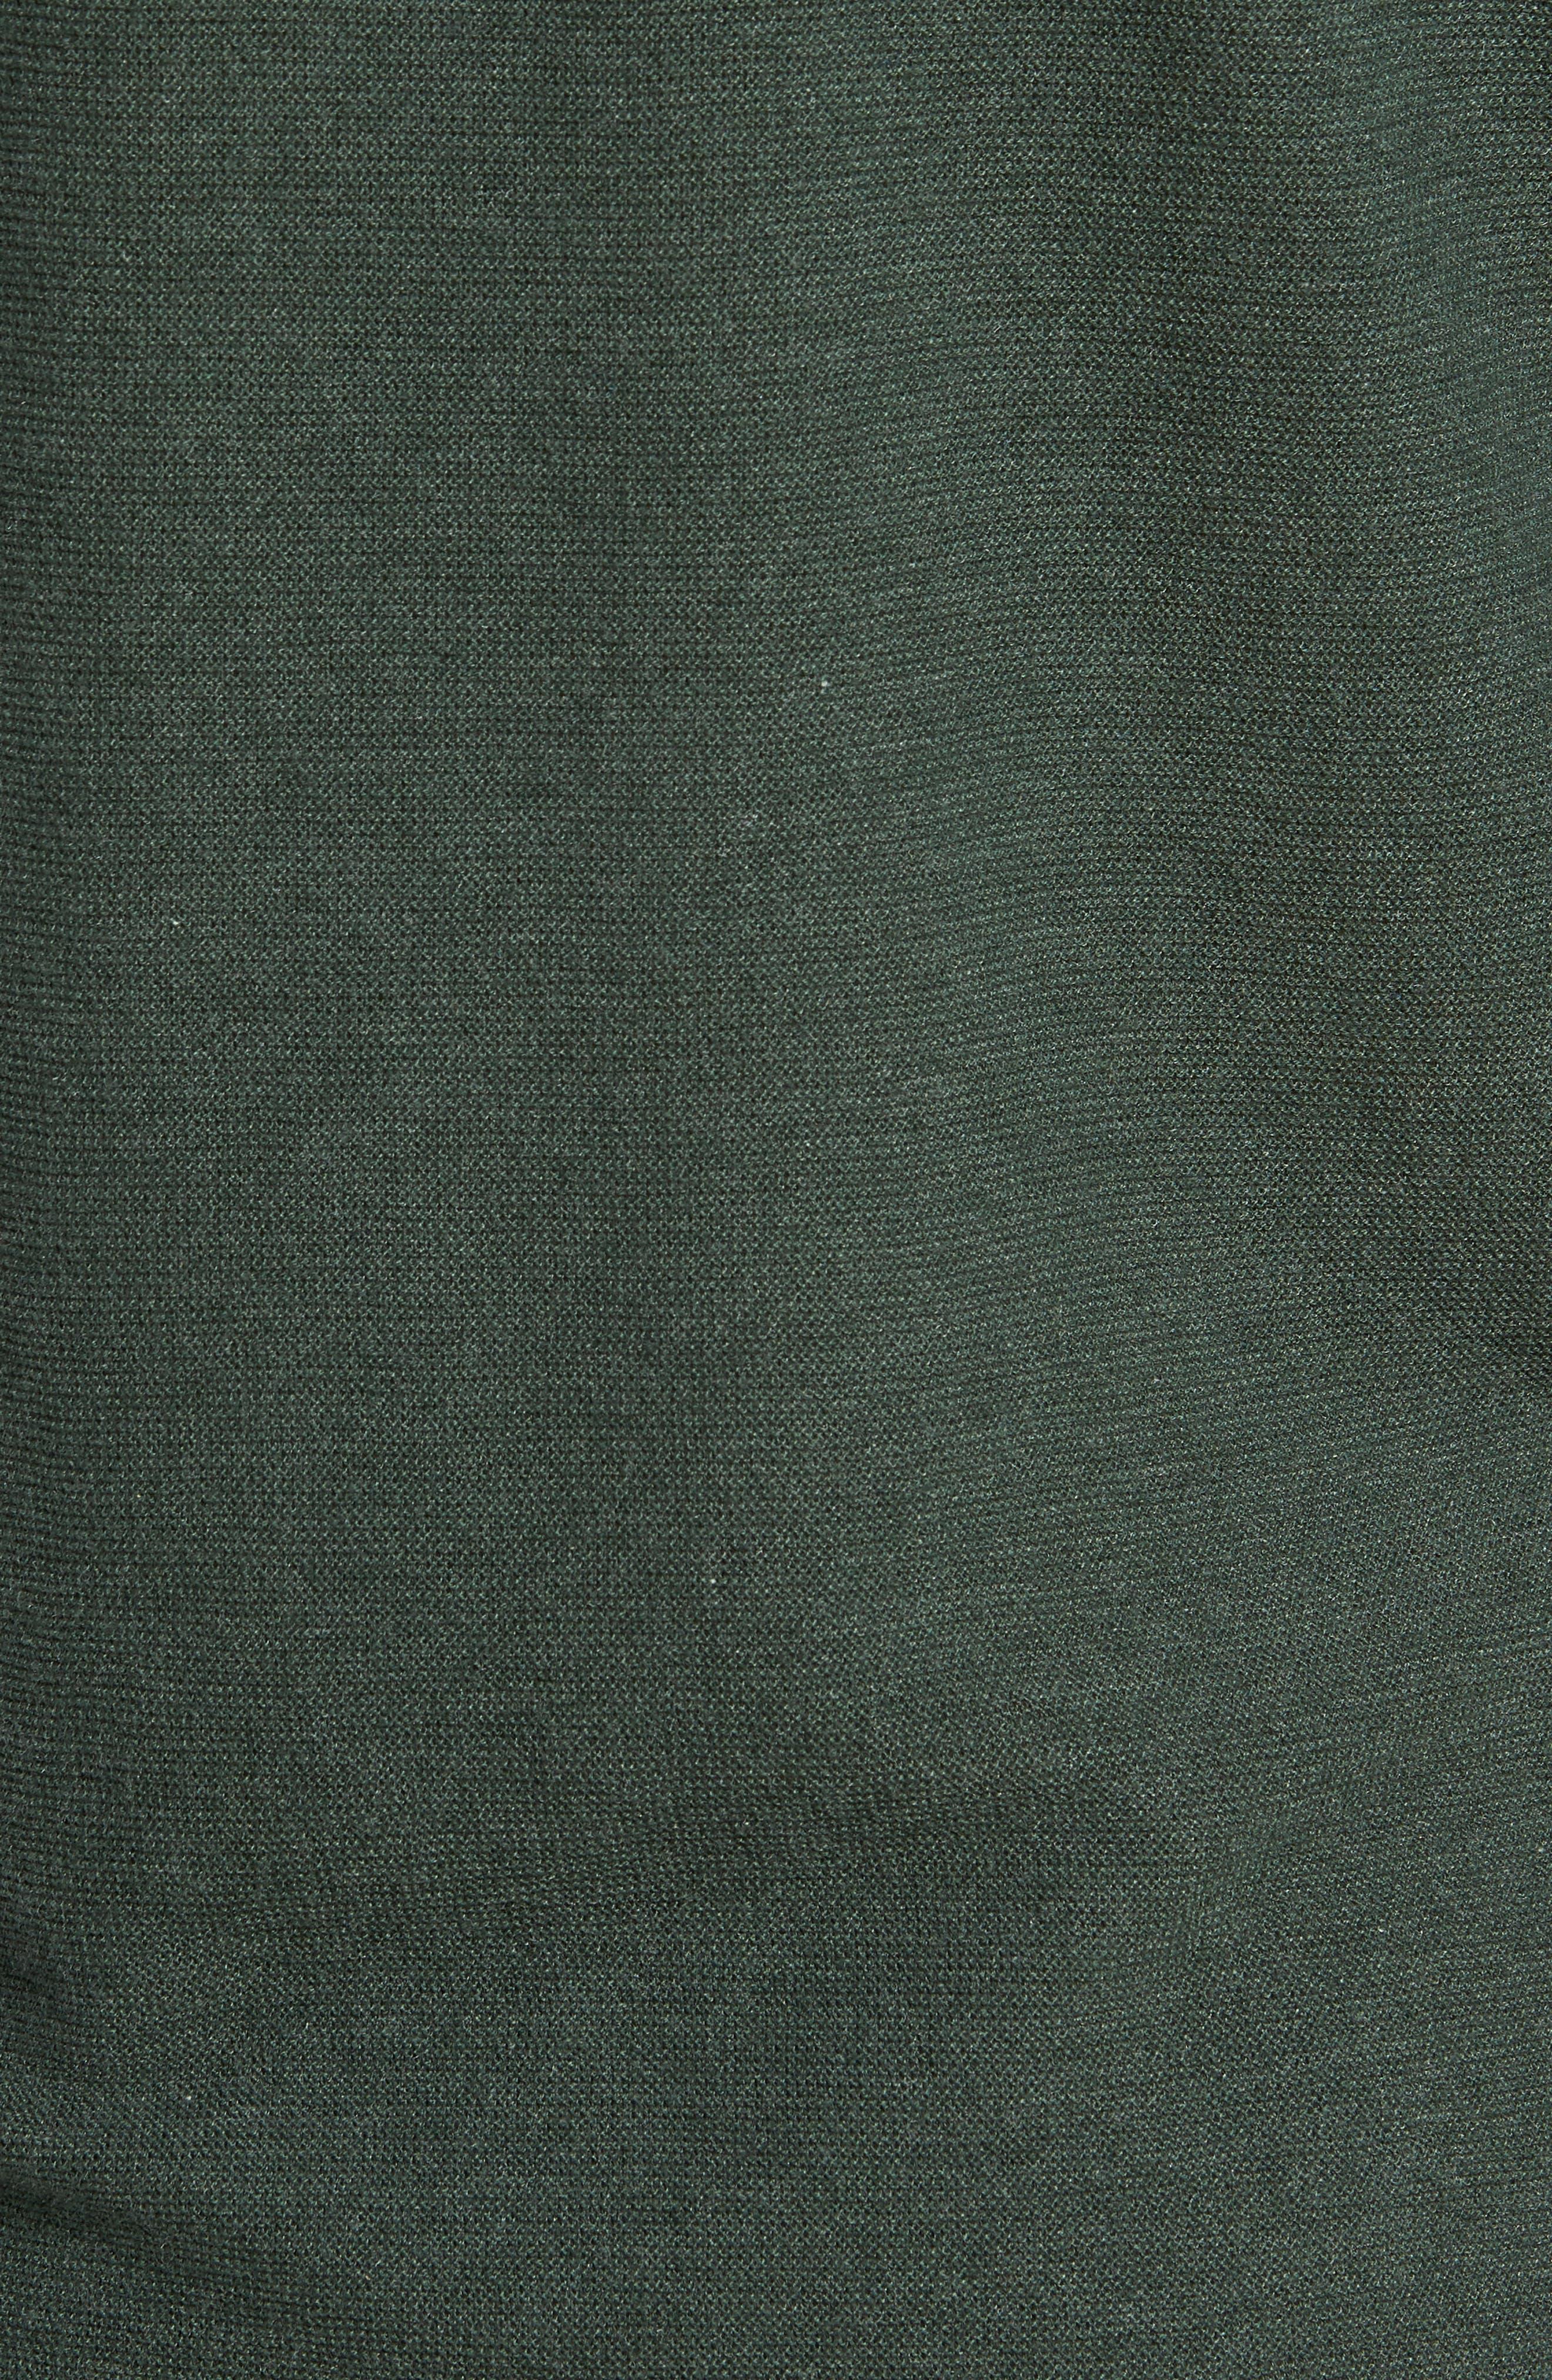 Slim Fit Crewneck Sweater,                             Alternate thumbnail 5, color,                             300